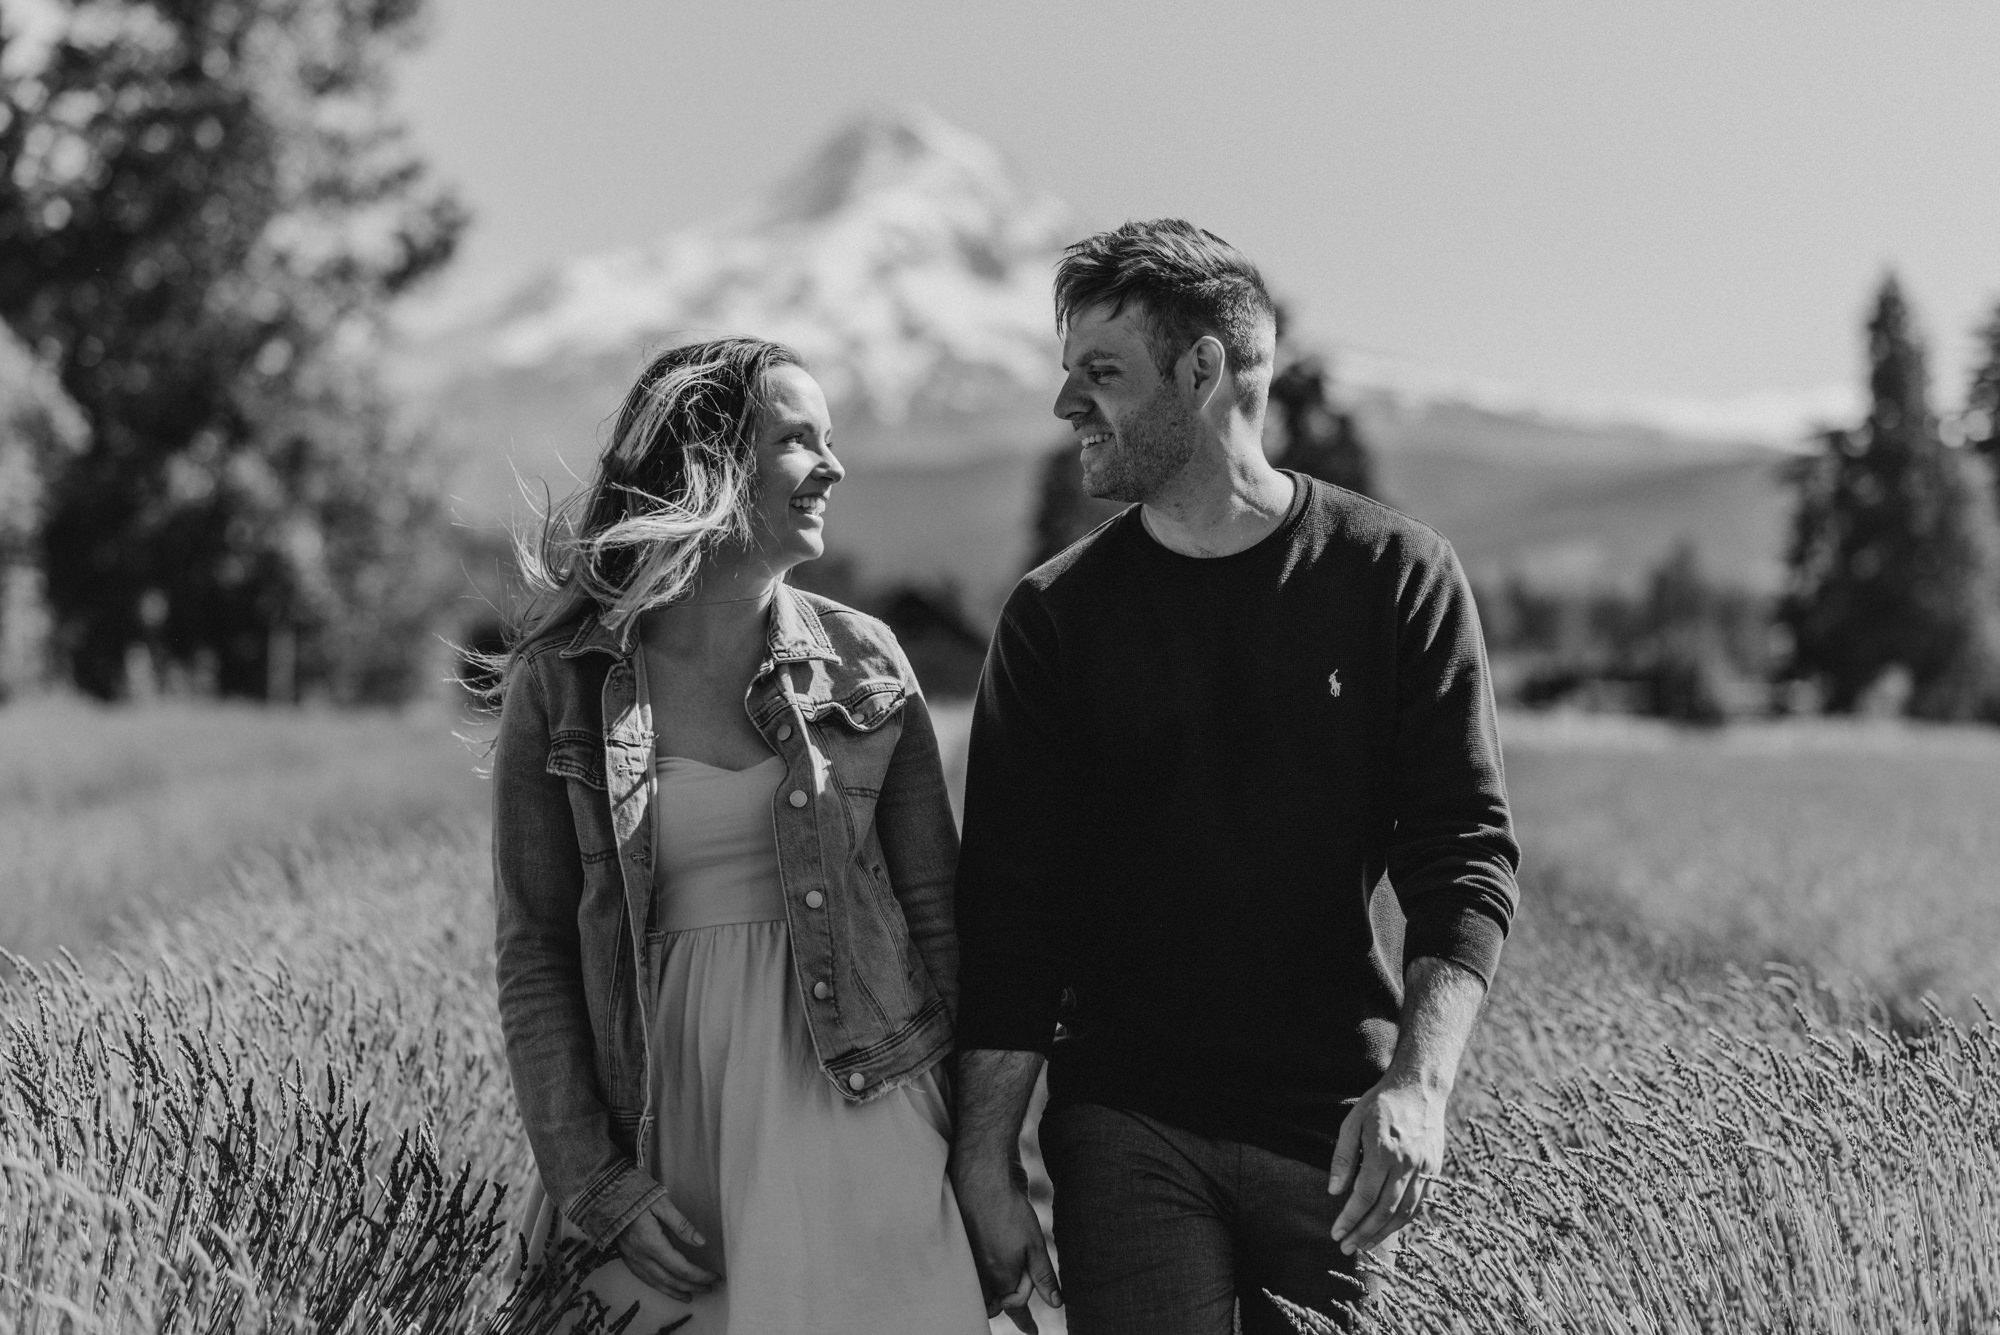 28-Mt-hood-lavender-farms-engagment-couple-summer-7786.jpg